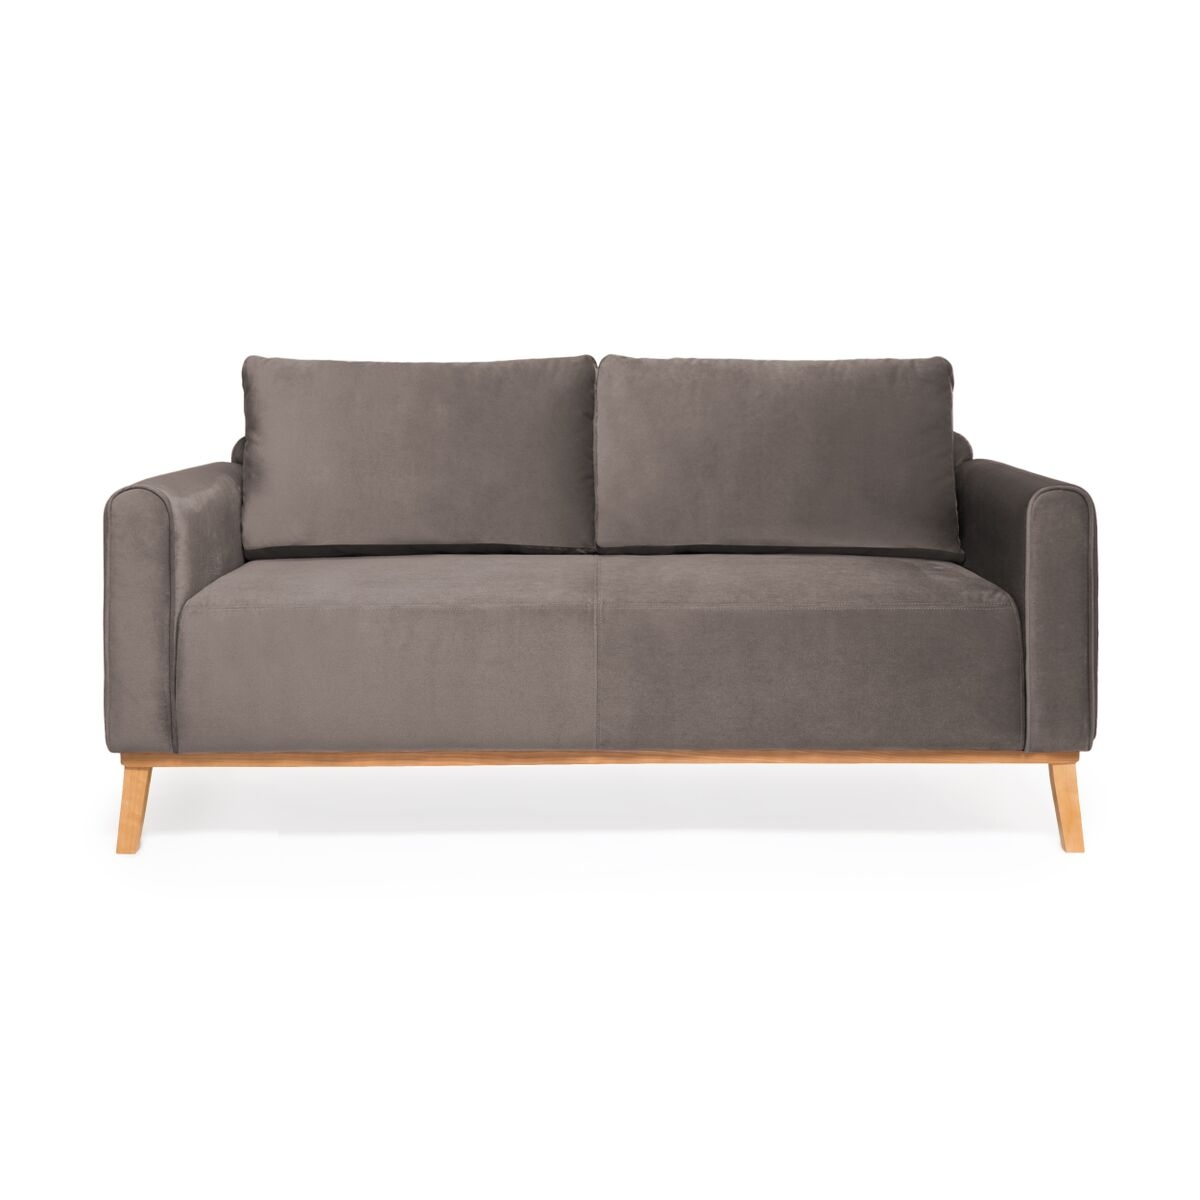 Canapea Fixa 3 locuri Milton Trend Grey